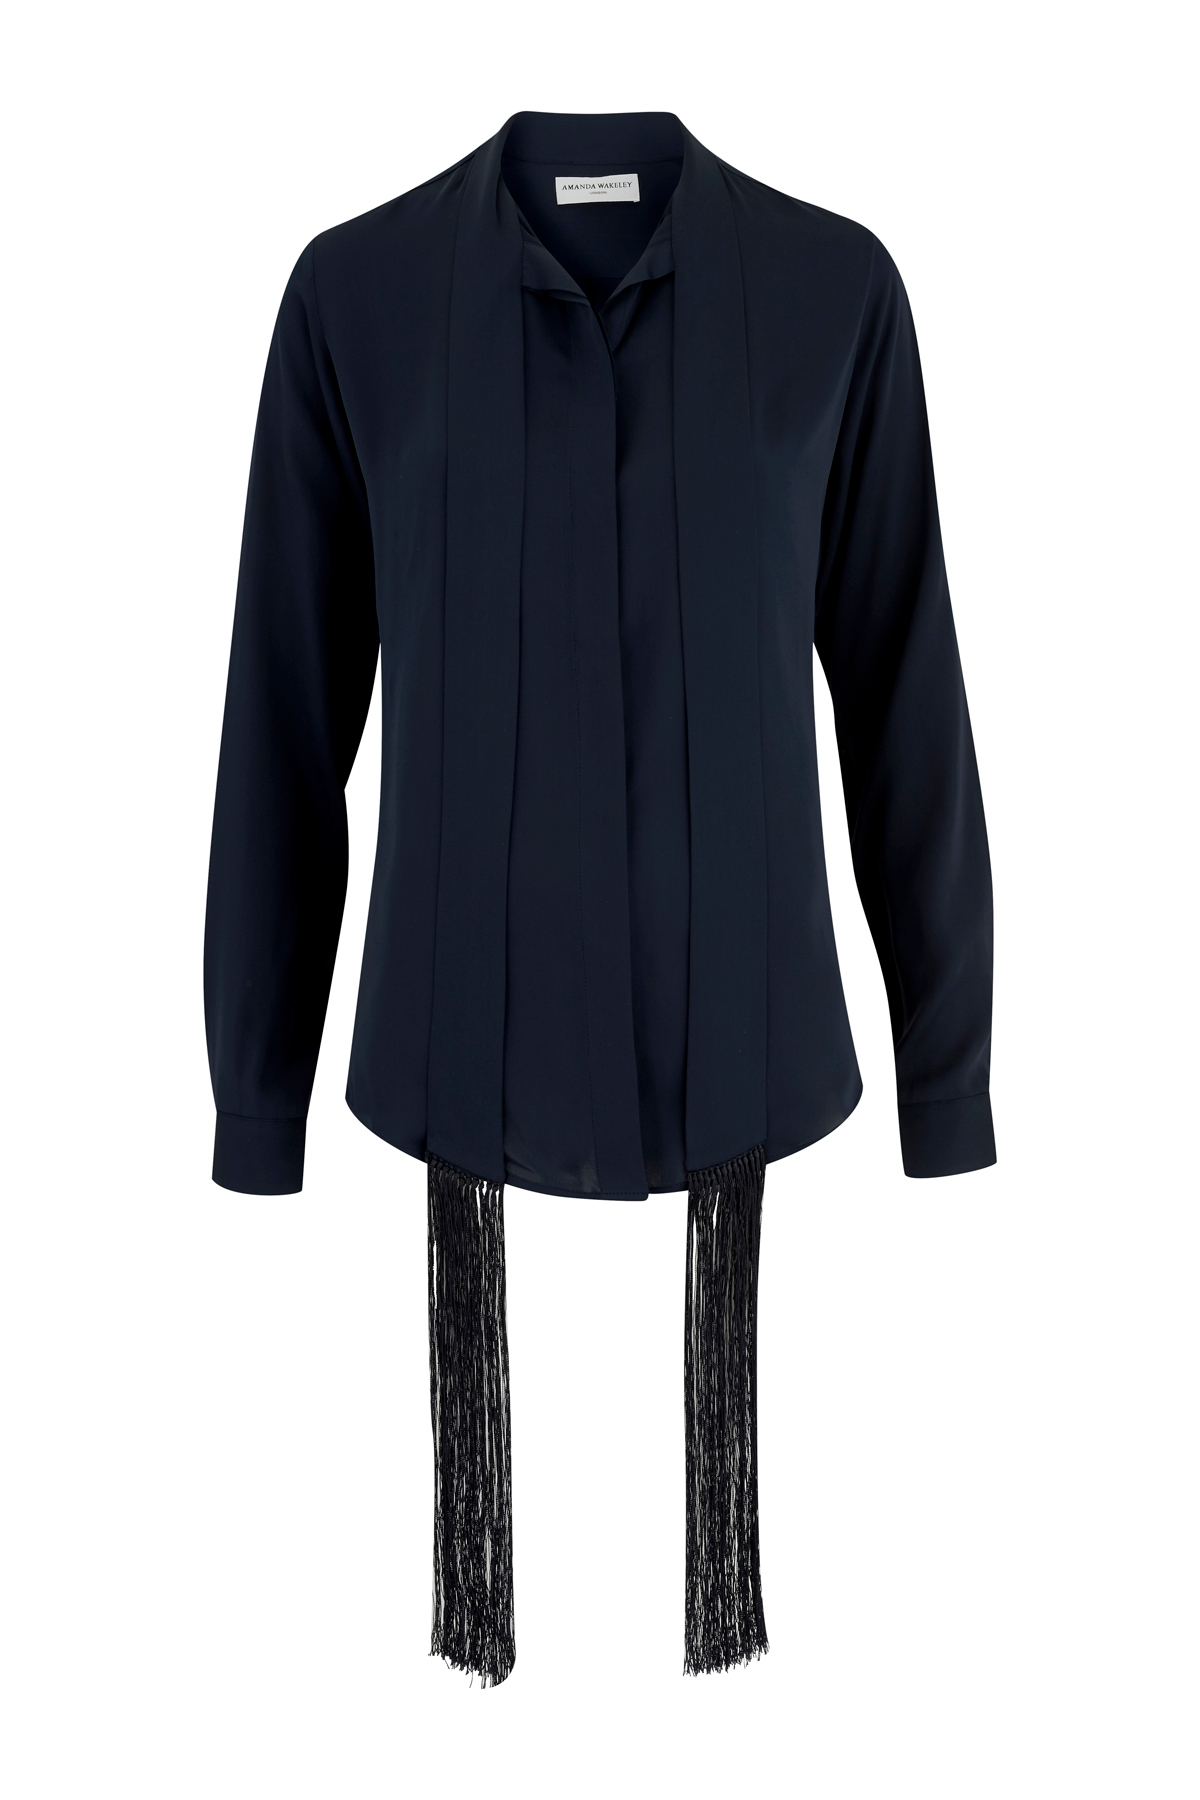 40ff9d6cba29 Amanda Wakeley Clothing - Womens - Harvey Nichols